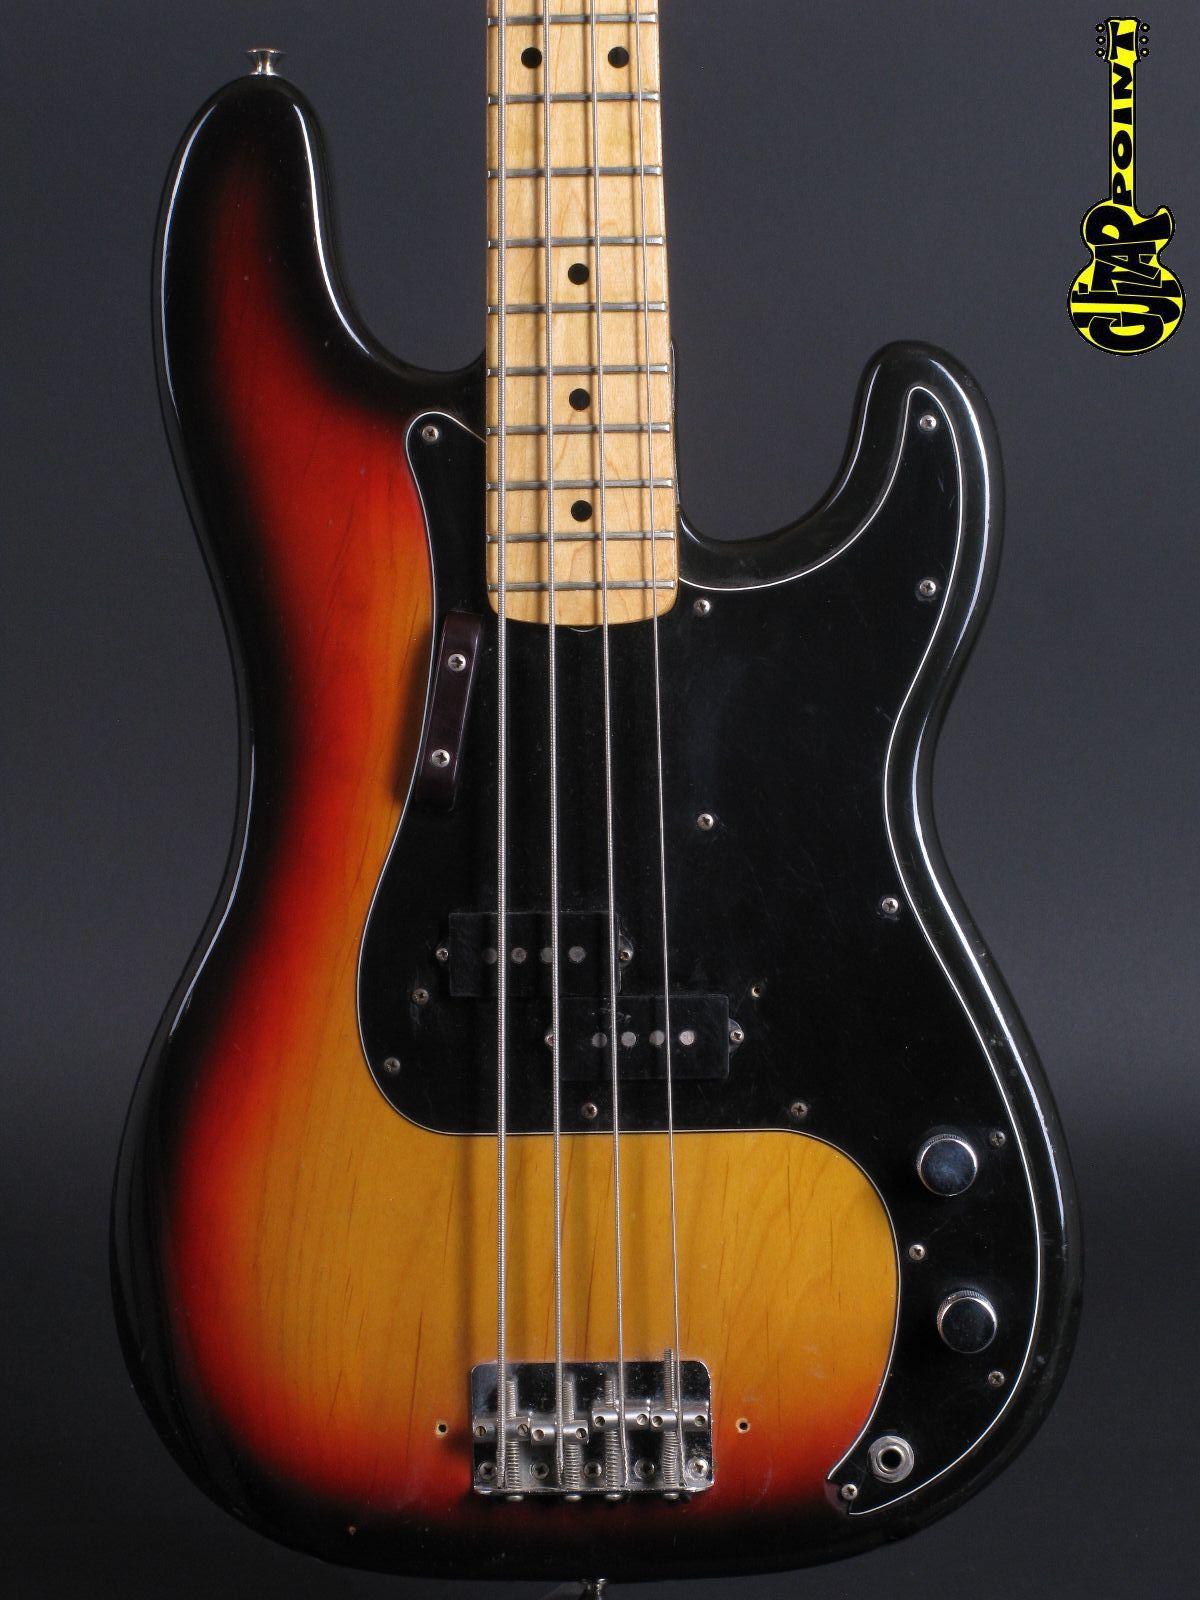 1973 Fender Precision Bass - 3-tone Sunburst